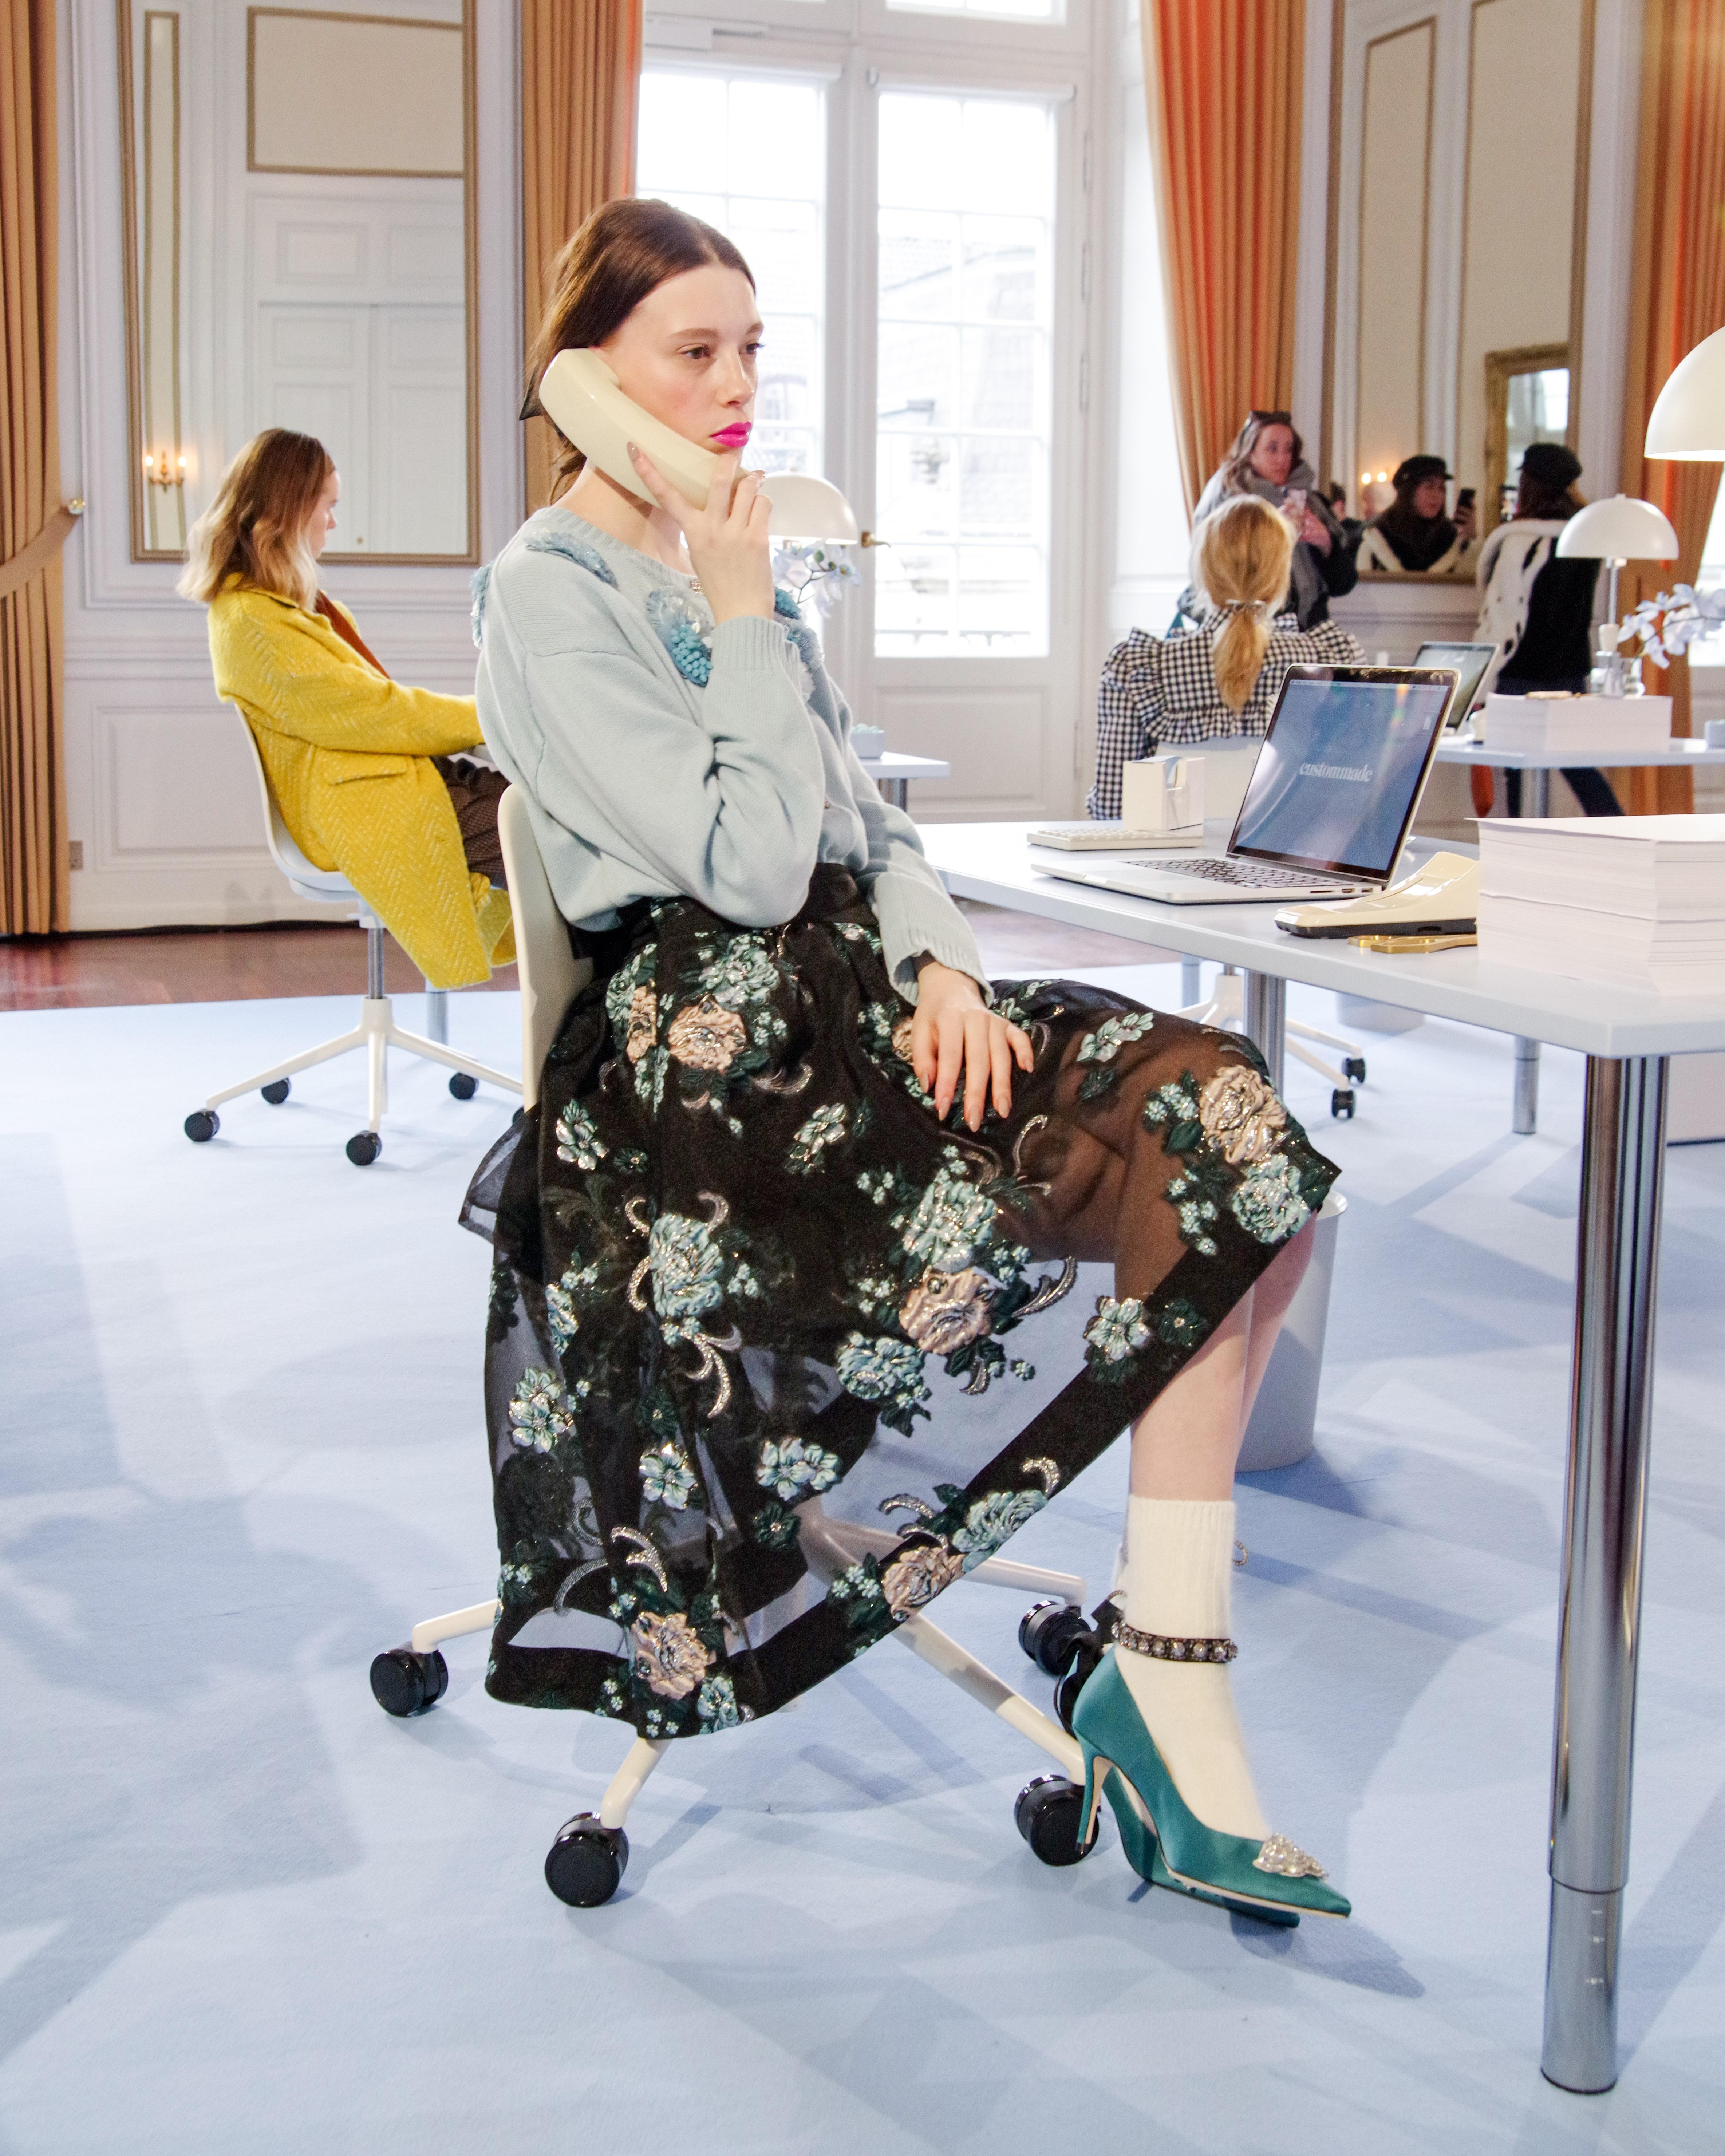 Custommade, AW20, model, Fashion Week, catwalk, modeshow. (Foto: Copenhagen Fashion Week)